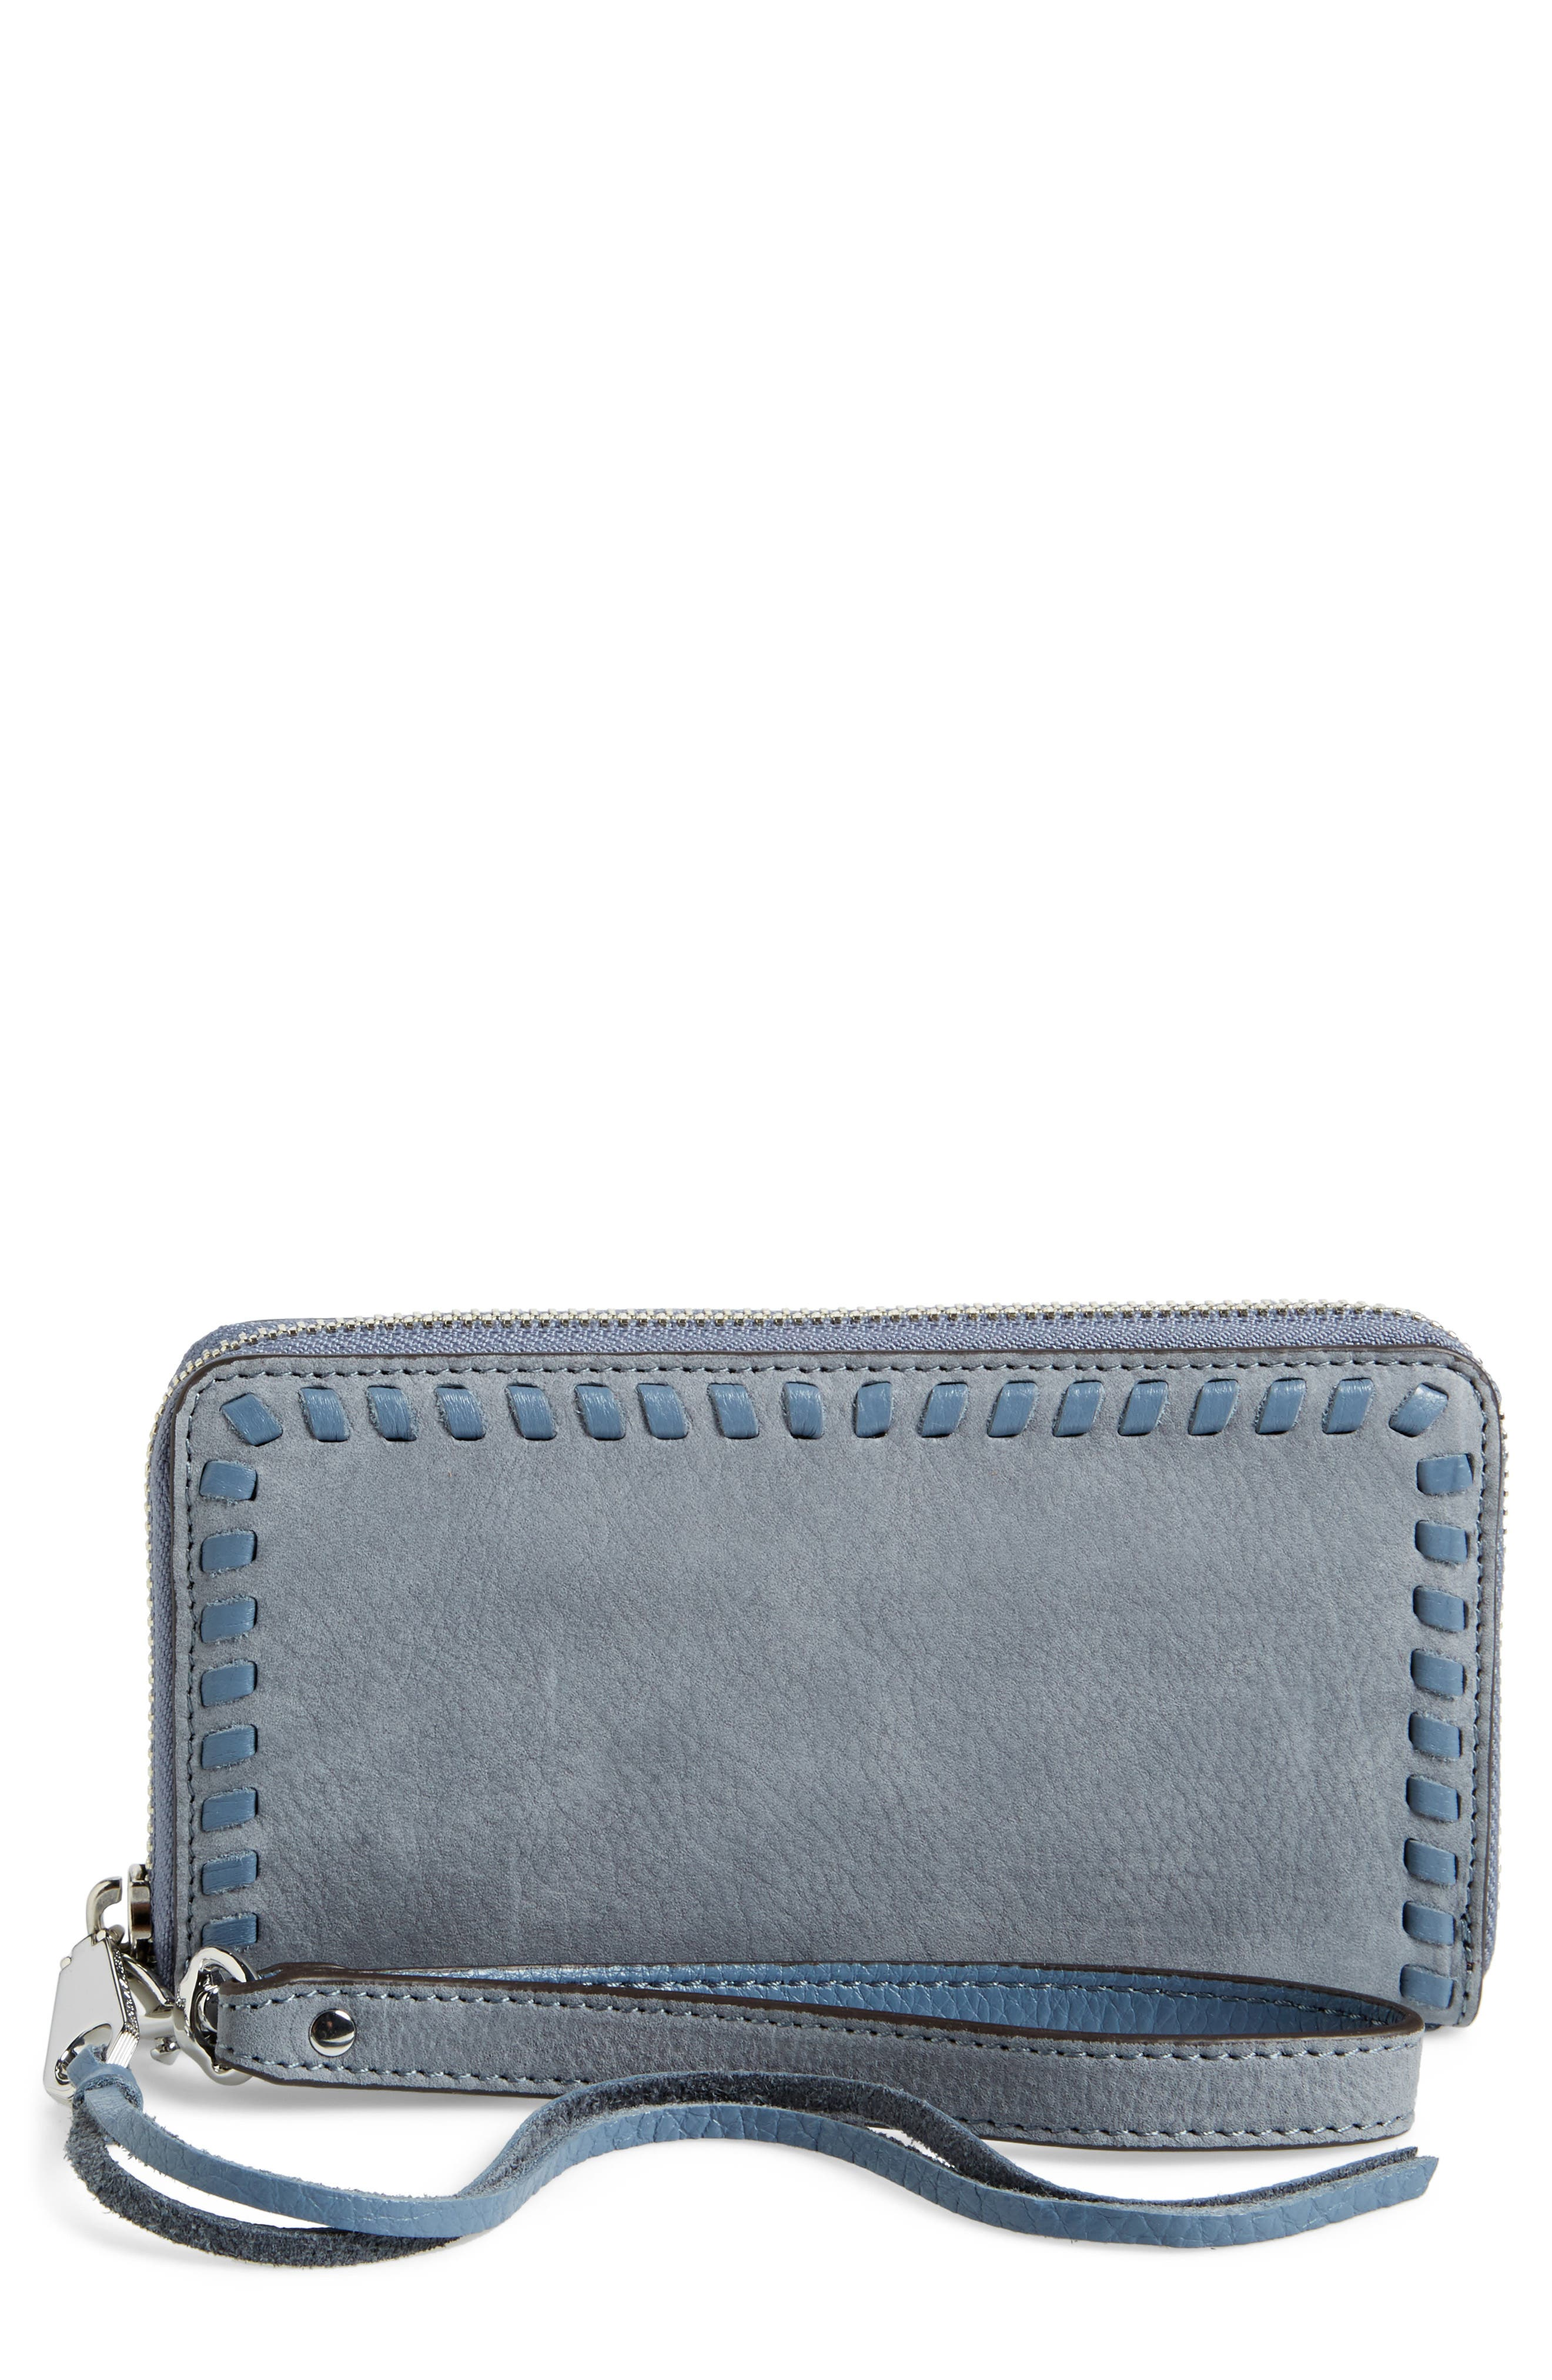 Main Image - Rebecca Minkoff Vanity Nubuck Leather Phone Wallet